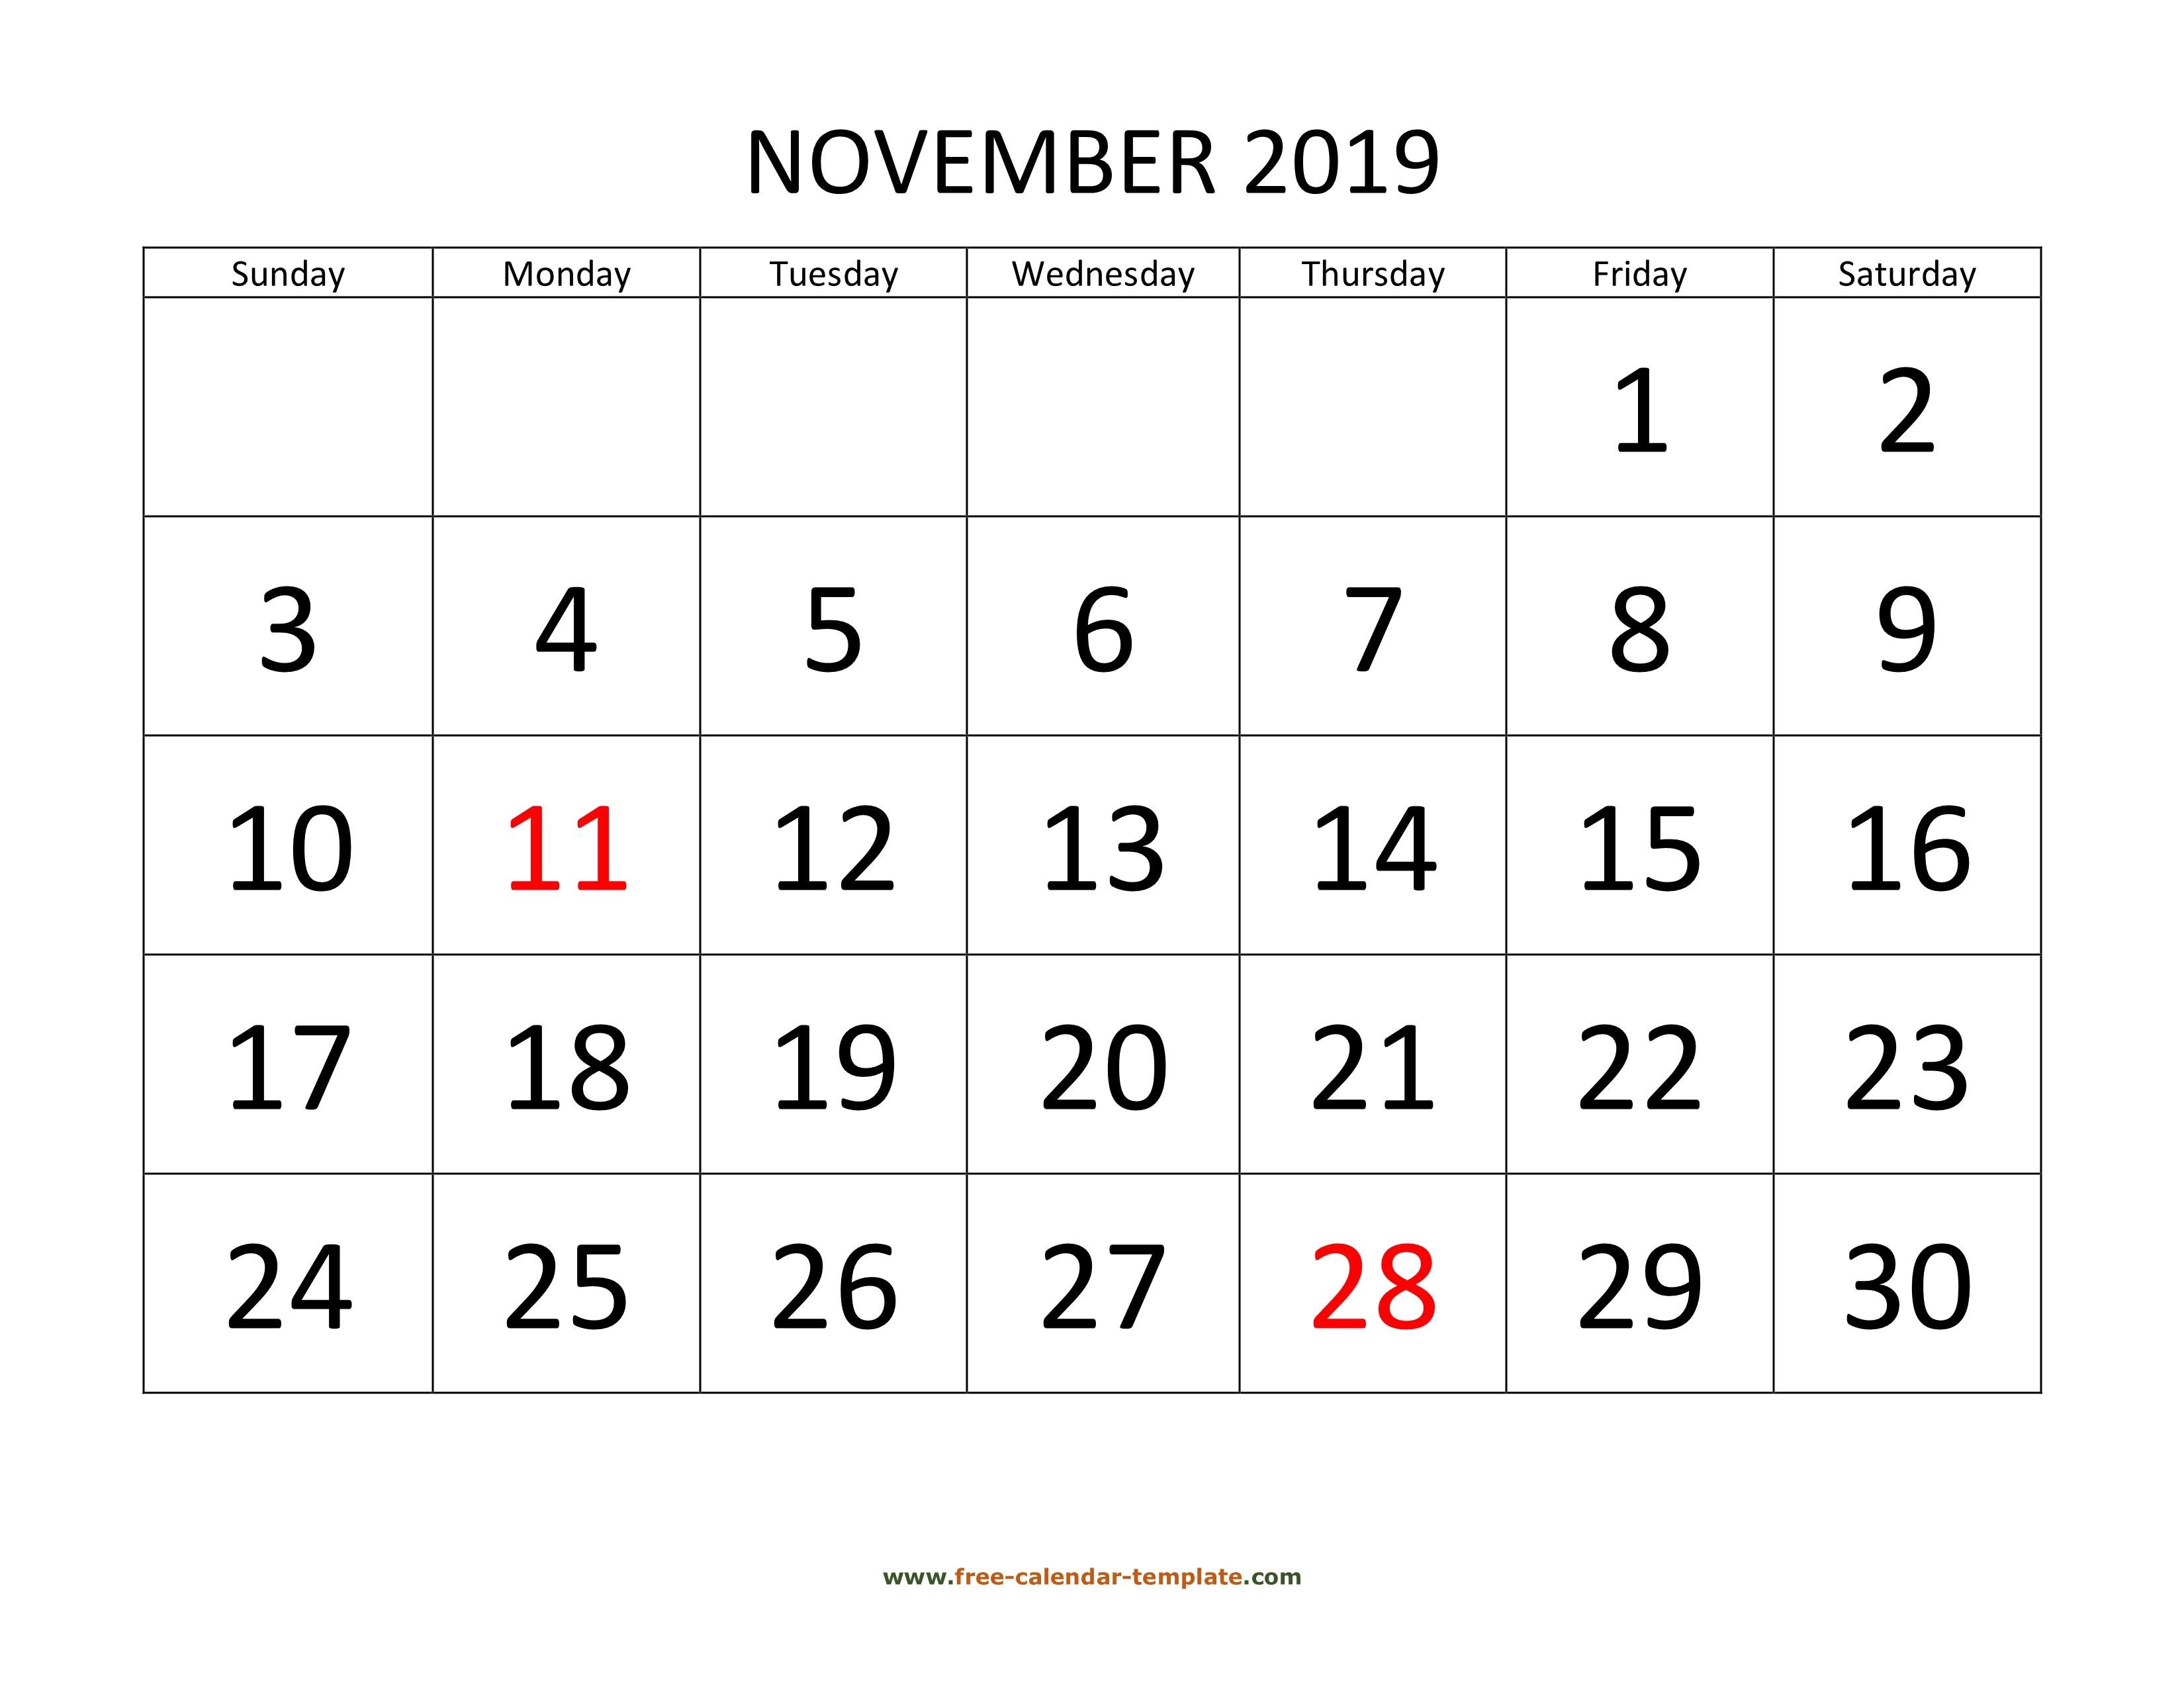 November 2019 Free Calendar Tempplate | Free-Calendar throughout Festive Printable Calendar 2020